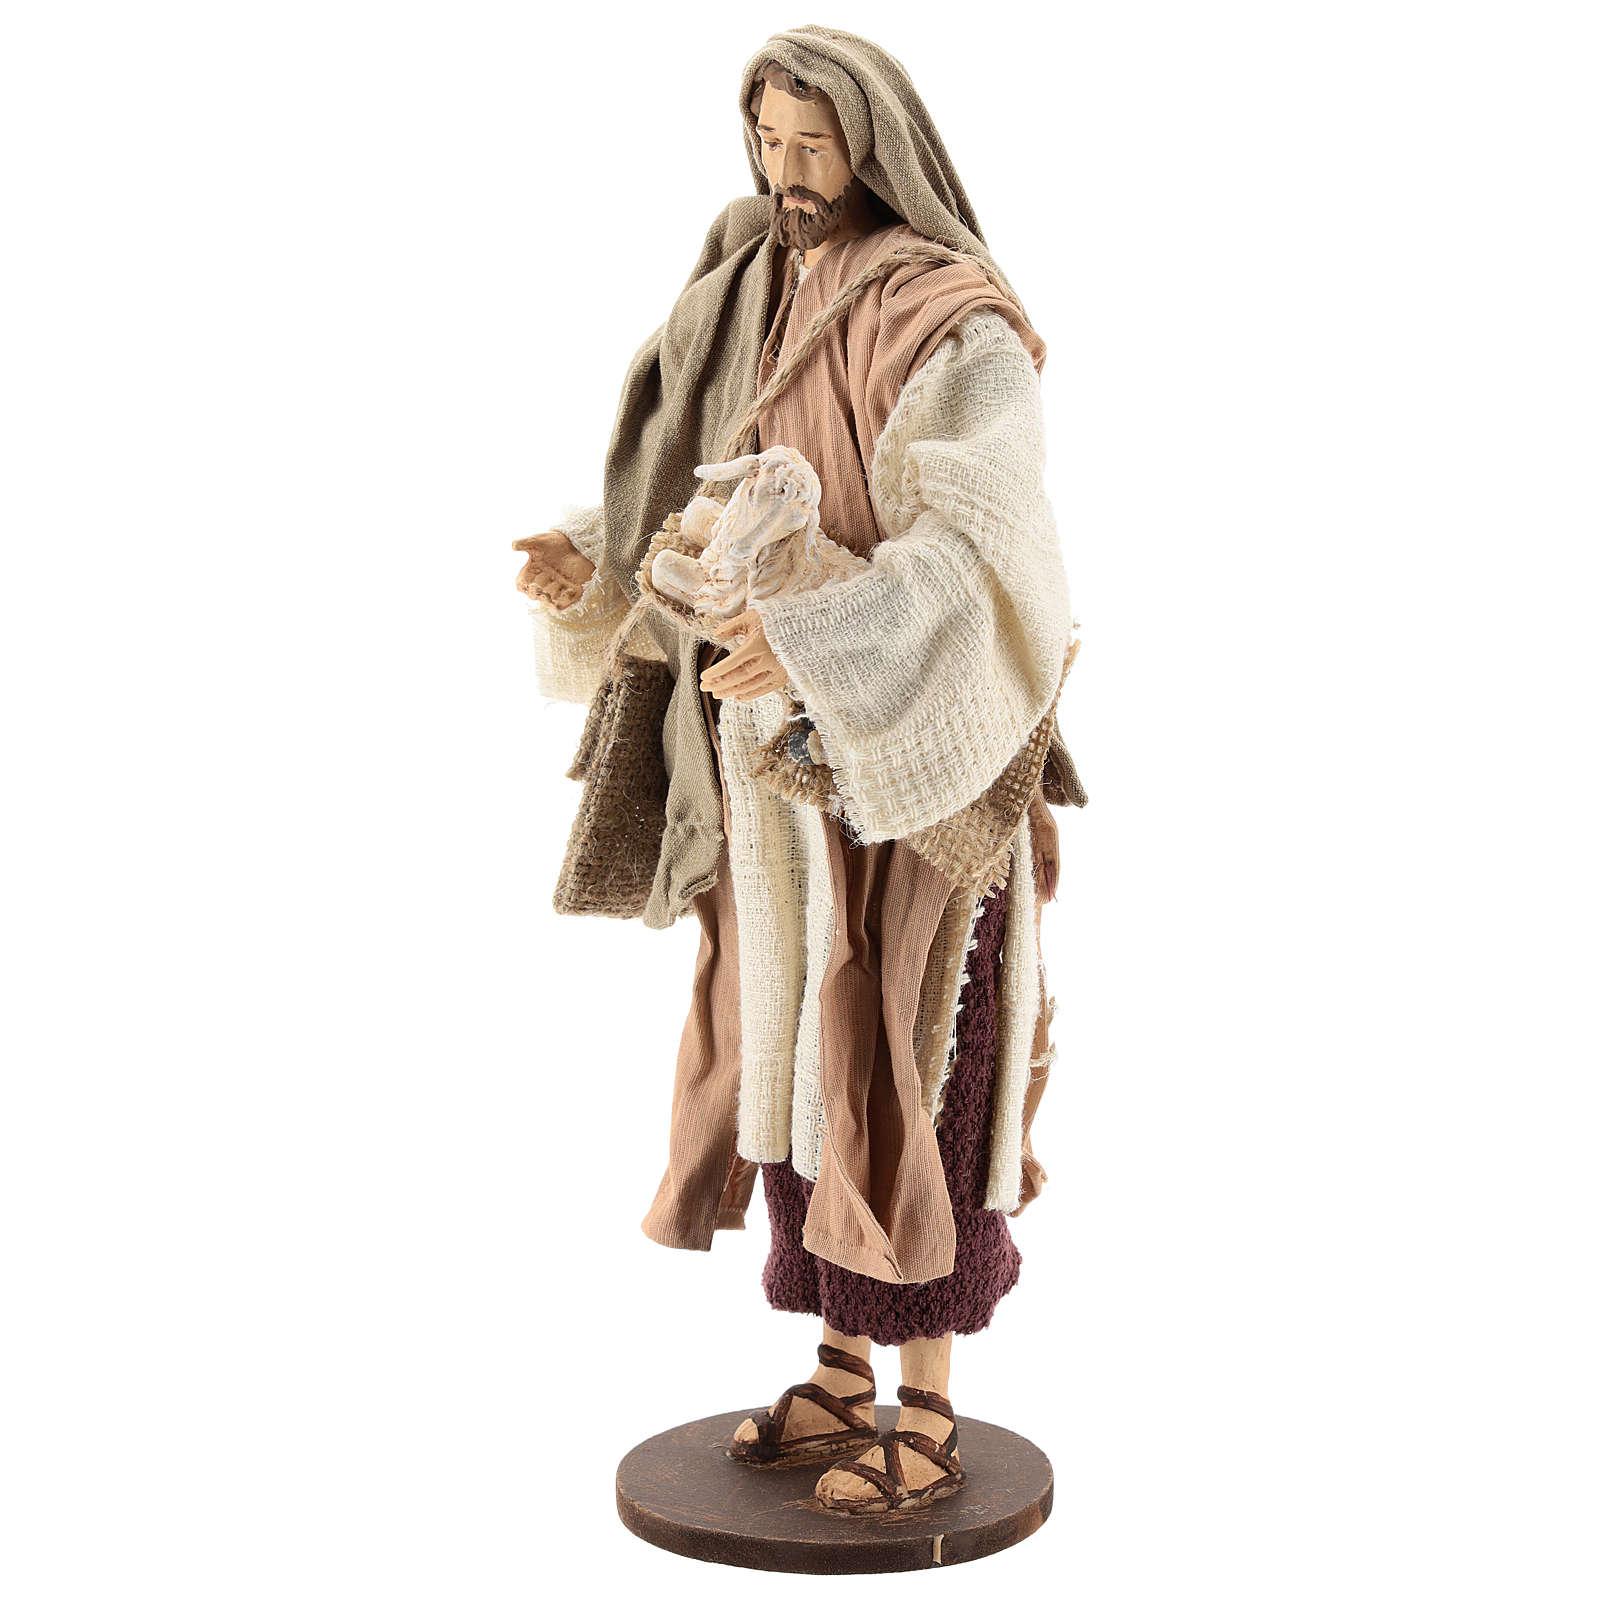 Pastor 30 cm de pie con ovejita Shabby Chic 3